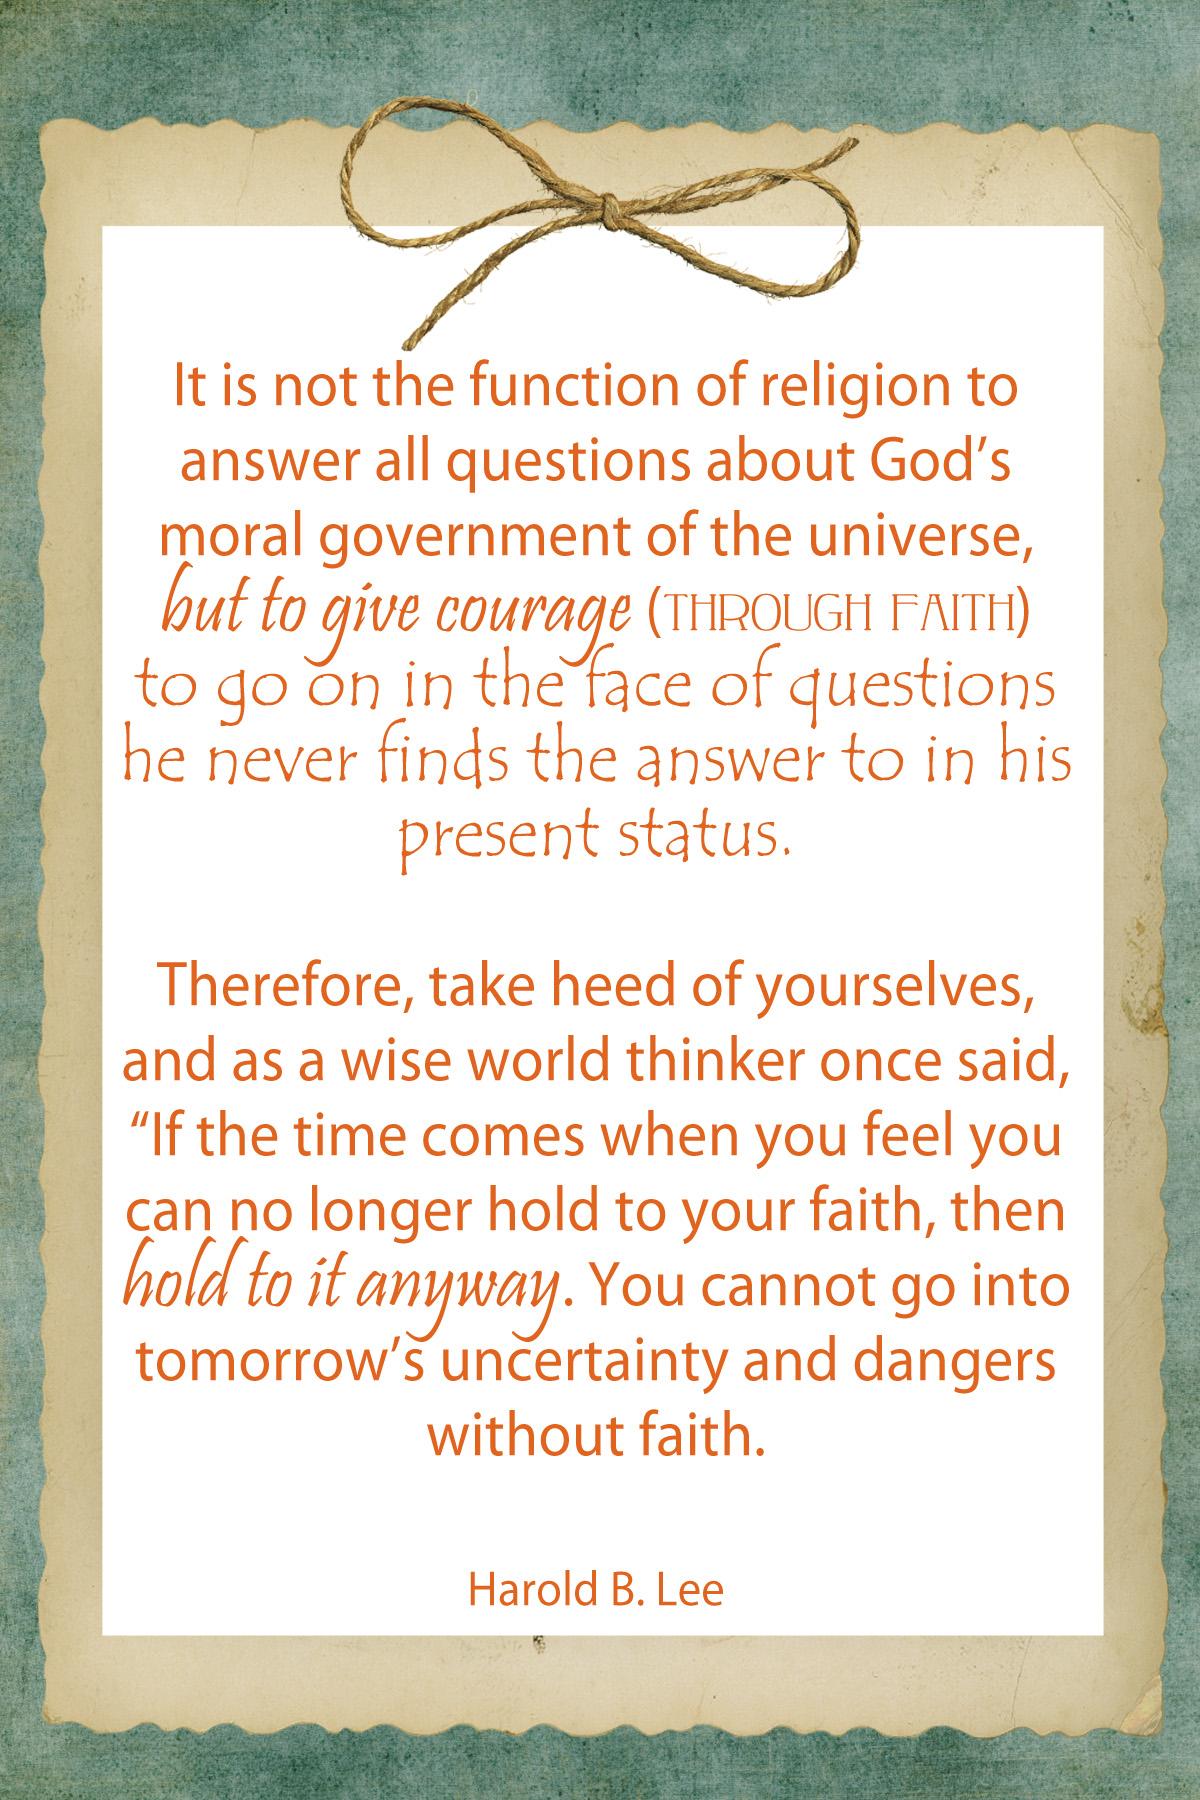 purpose of religion.jpg